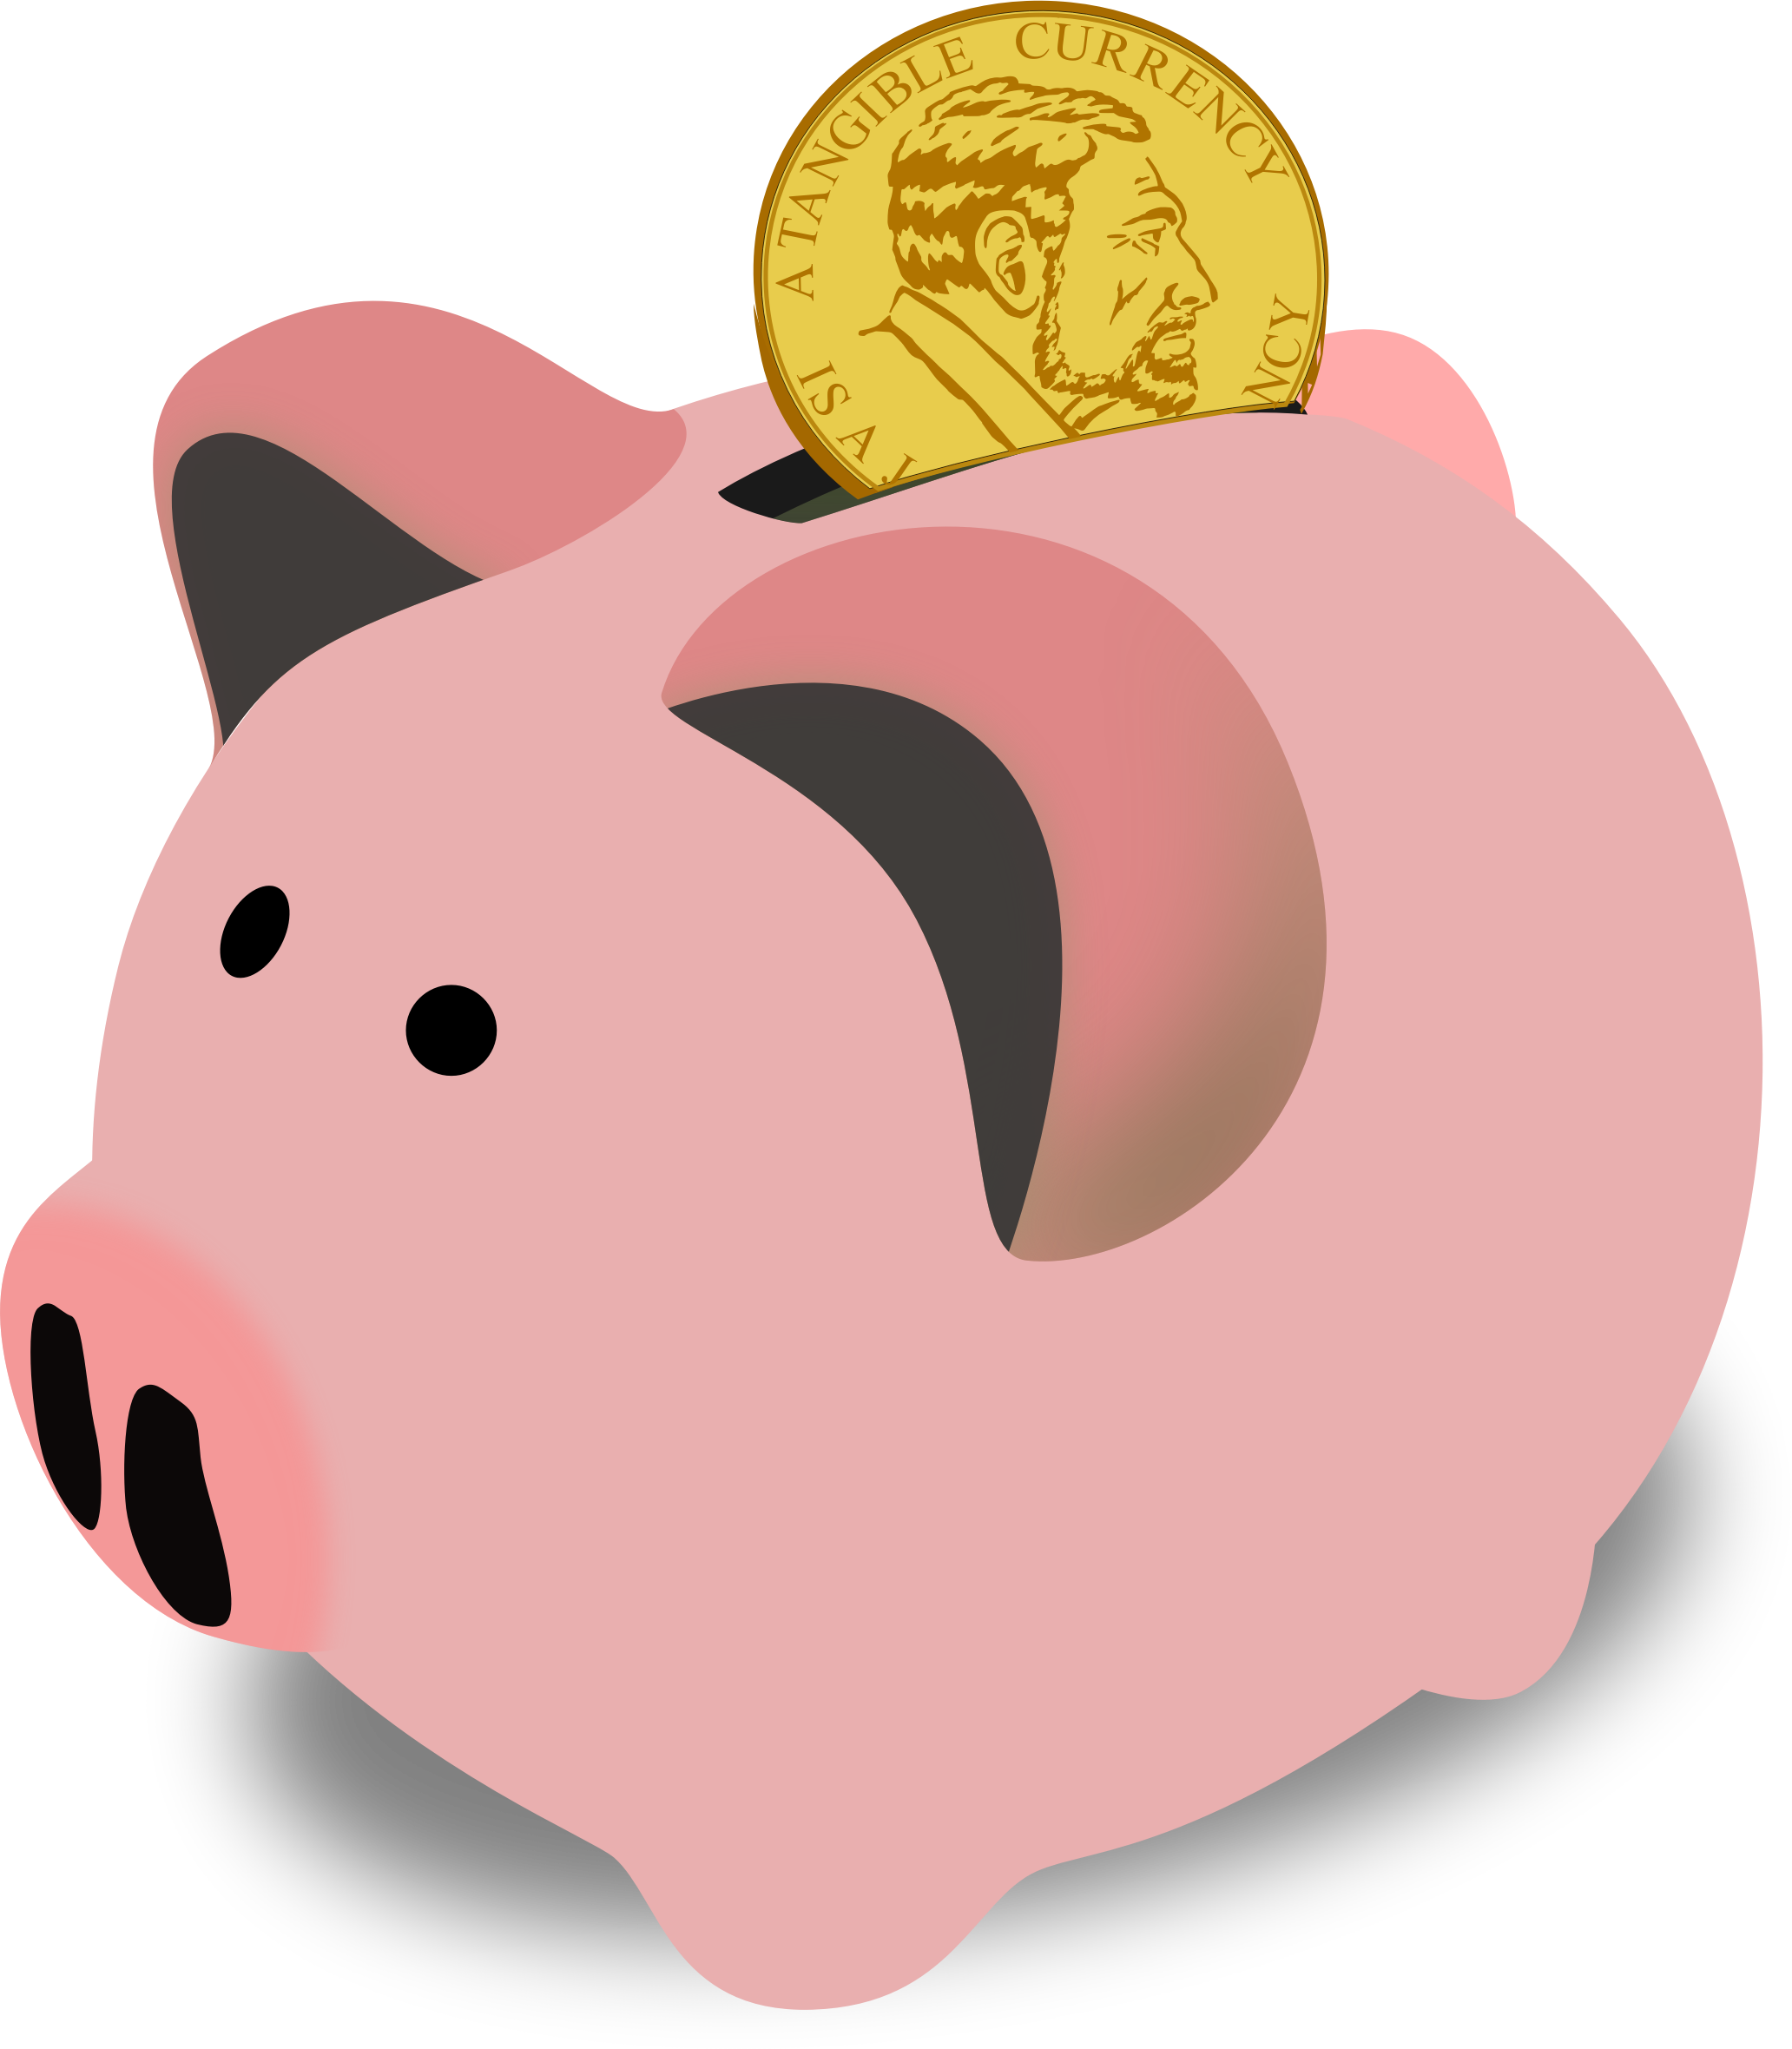 Finance clipart savings. Piggy bank big image